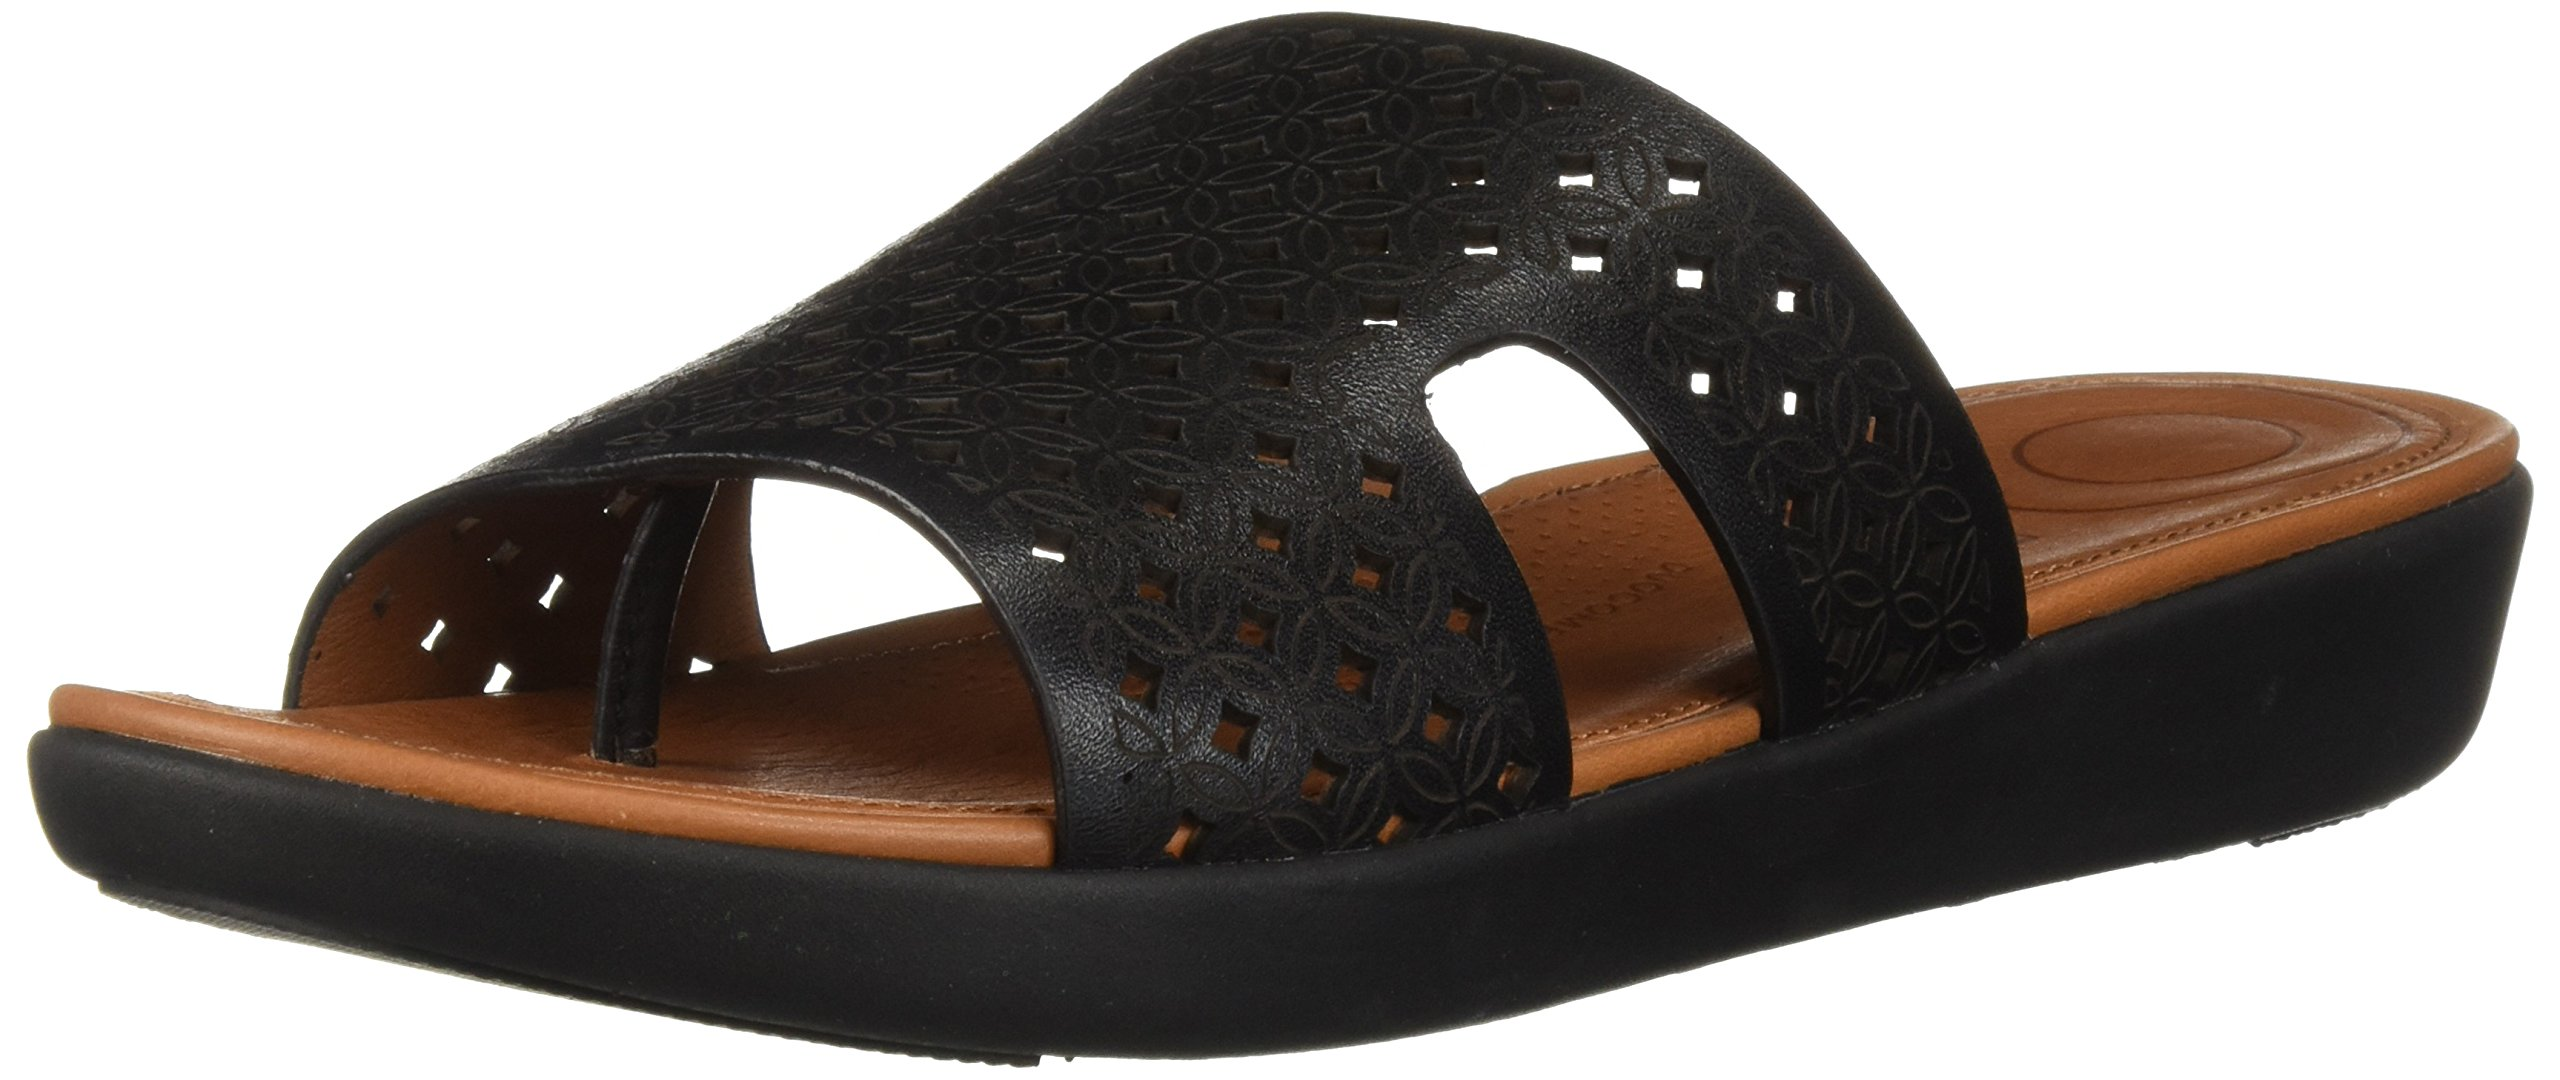 FitFlop Women's H-Bar Latticed Leather Slide Sandal, Black, 5 M US